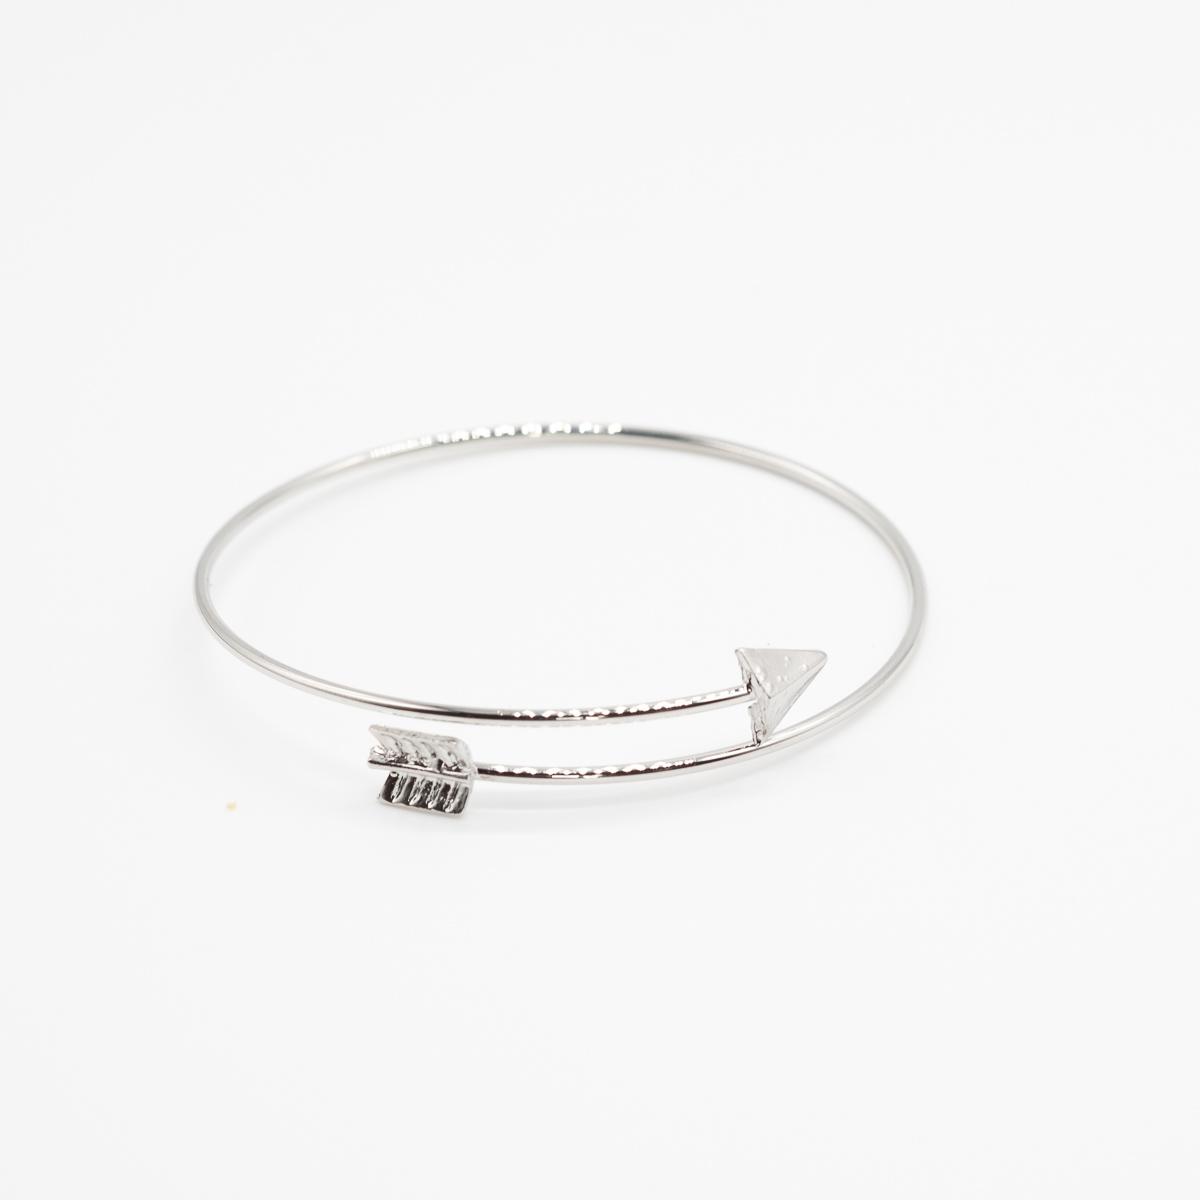 BCT-014 zilver pijl boho kopen armband